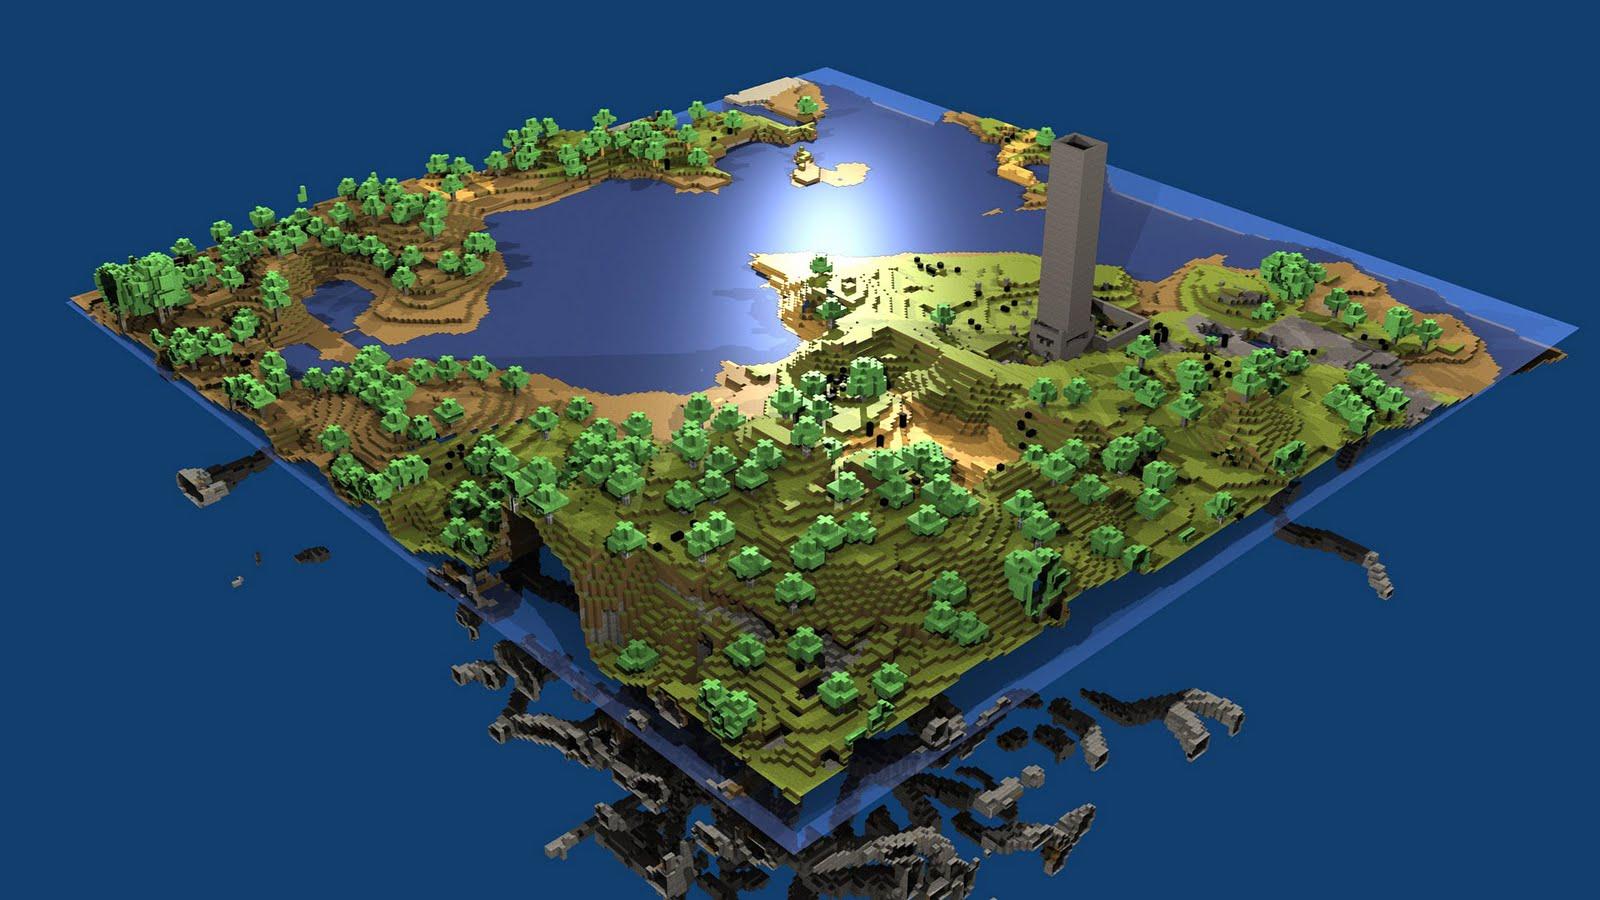 http://2.bp.blogspot.com/-UzWvFw9mob0/TbPxYIsXdtI/AAAAAAAAEuQ/GY9ZH2MNGQc/s1600/Minecraft-Wallpaper-6.jpg